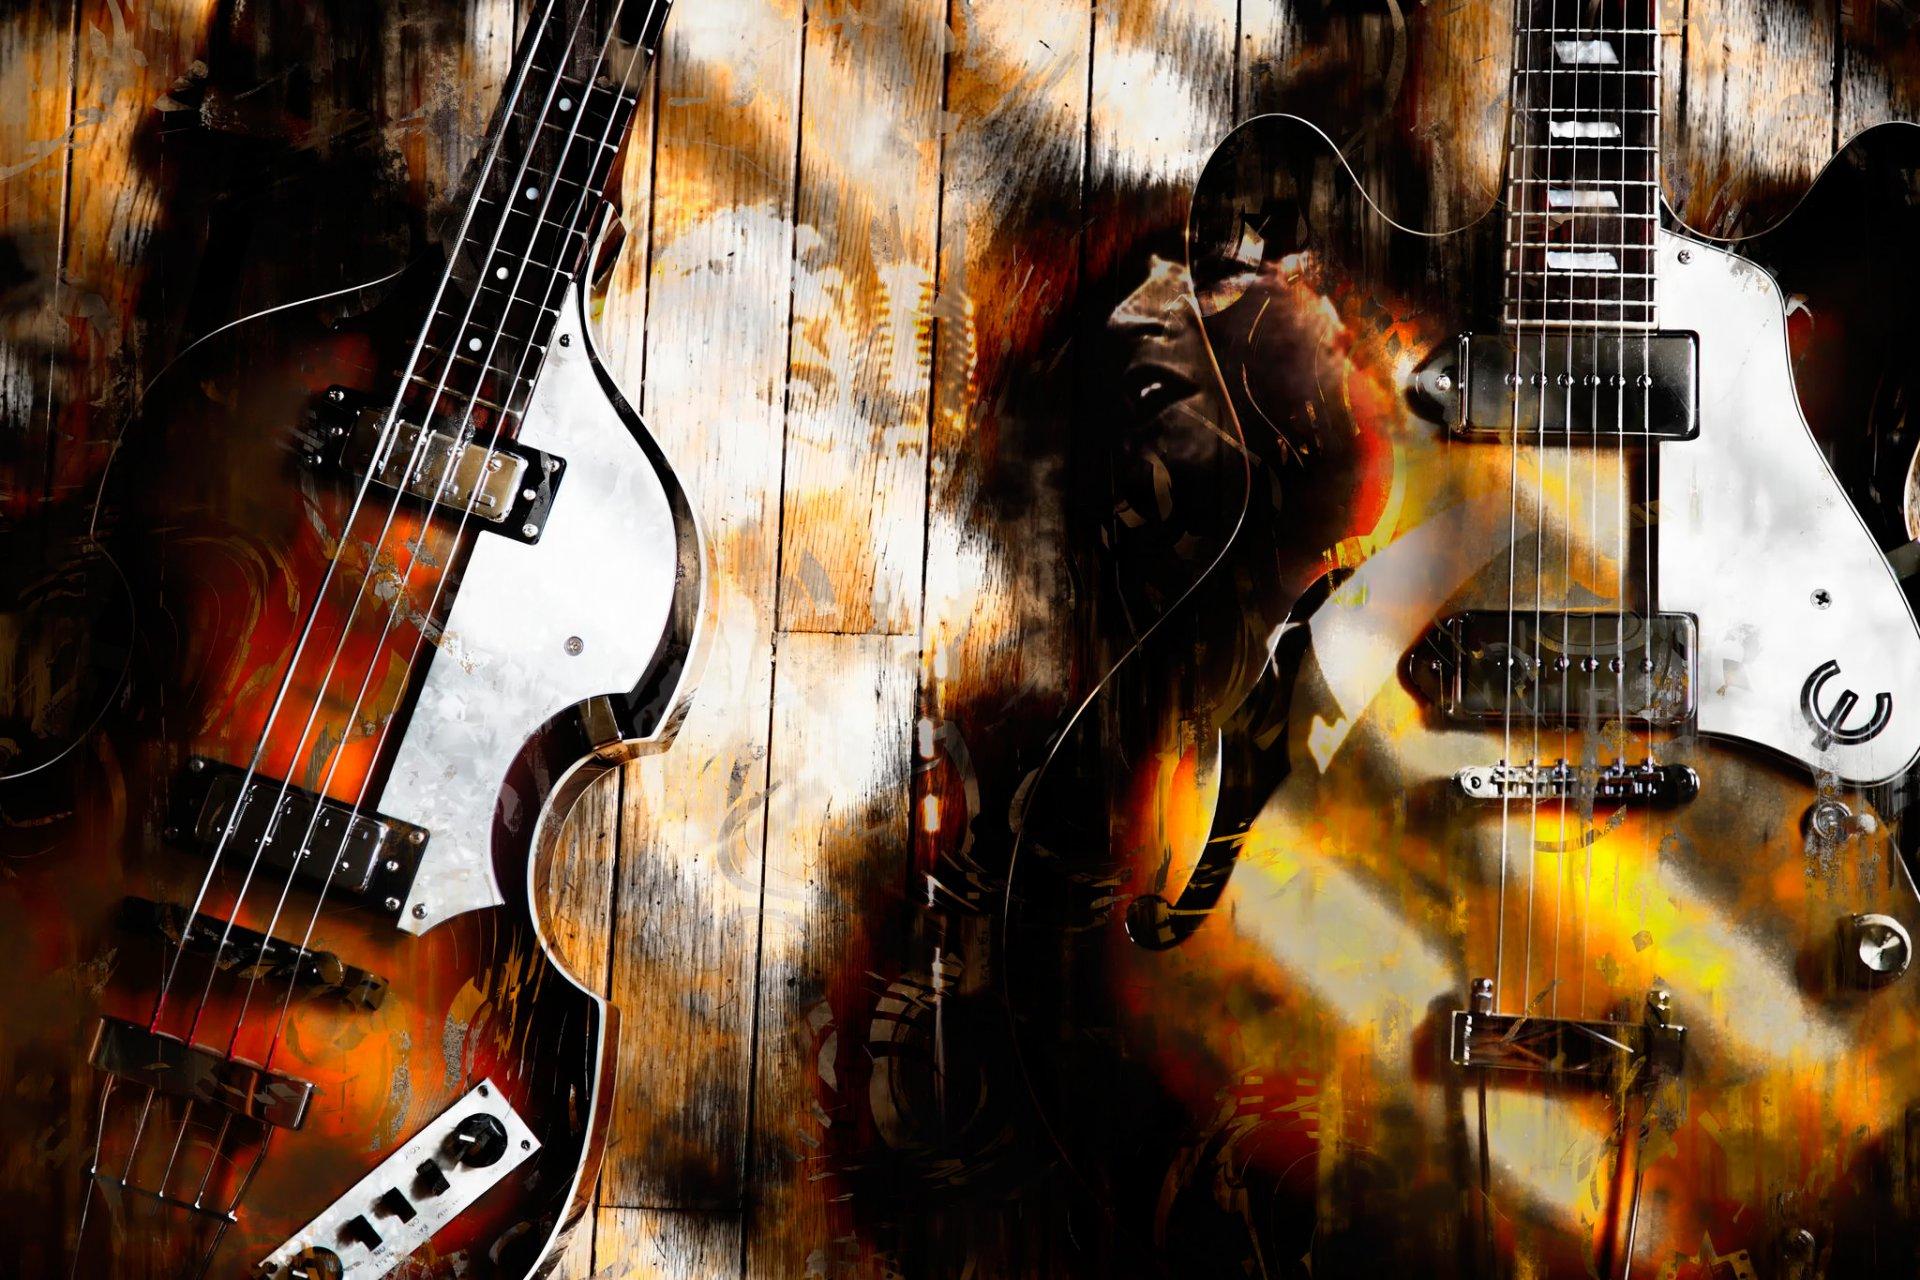 Постер с гитаристами